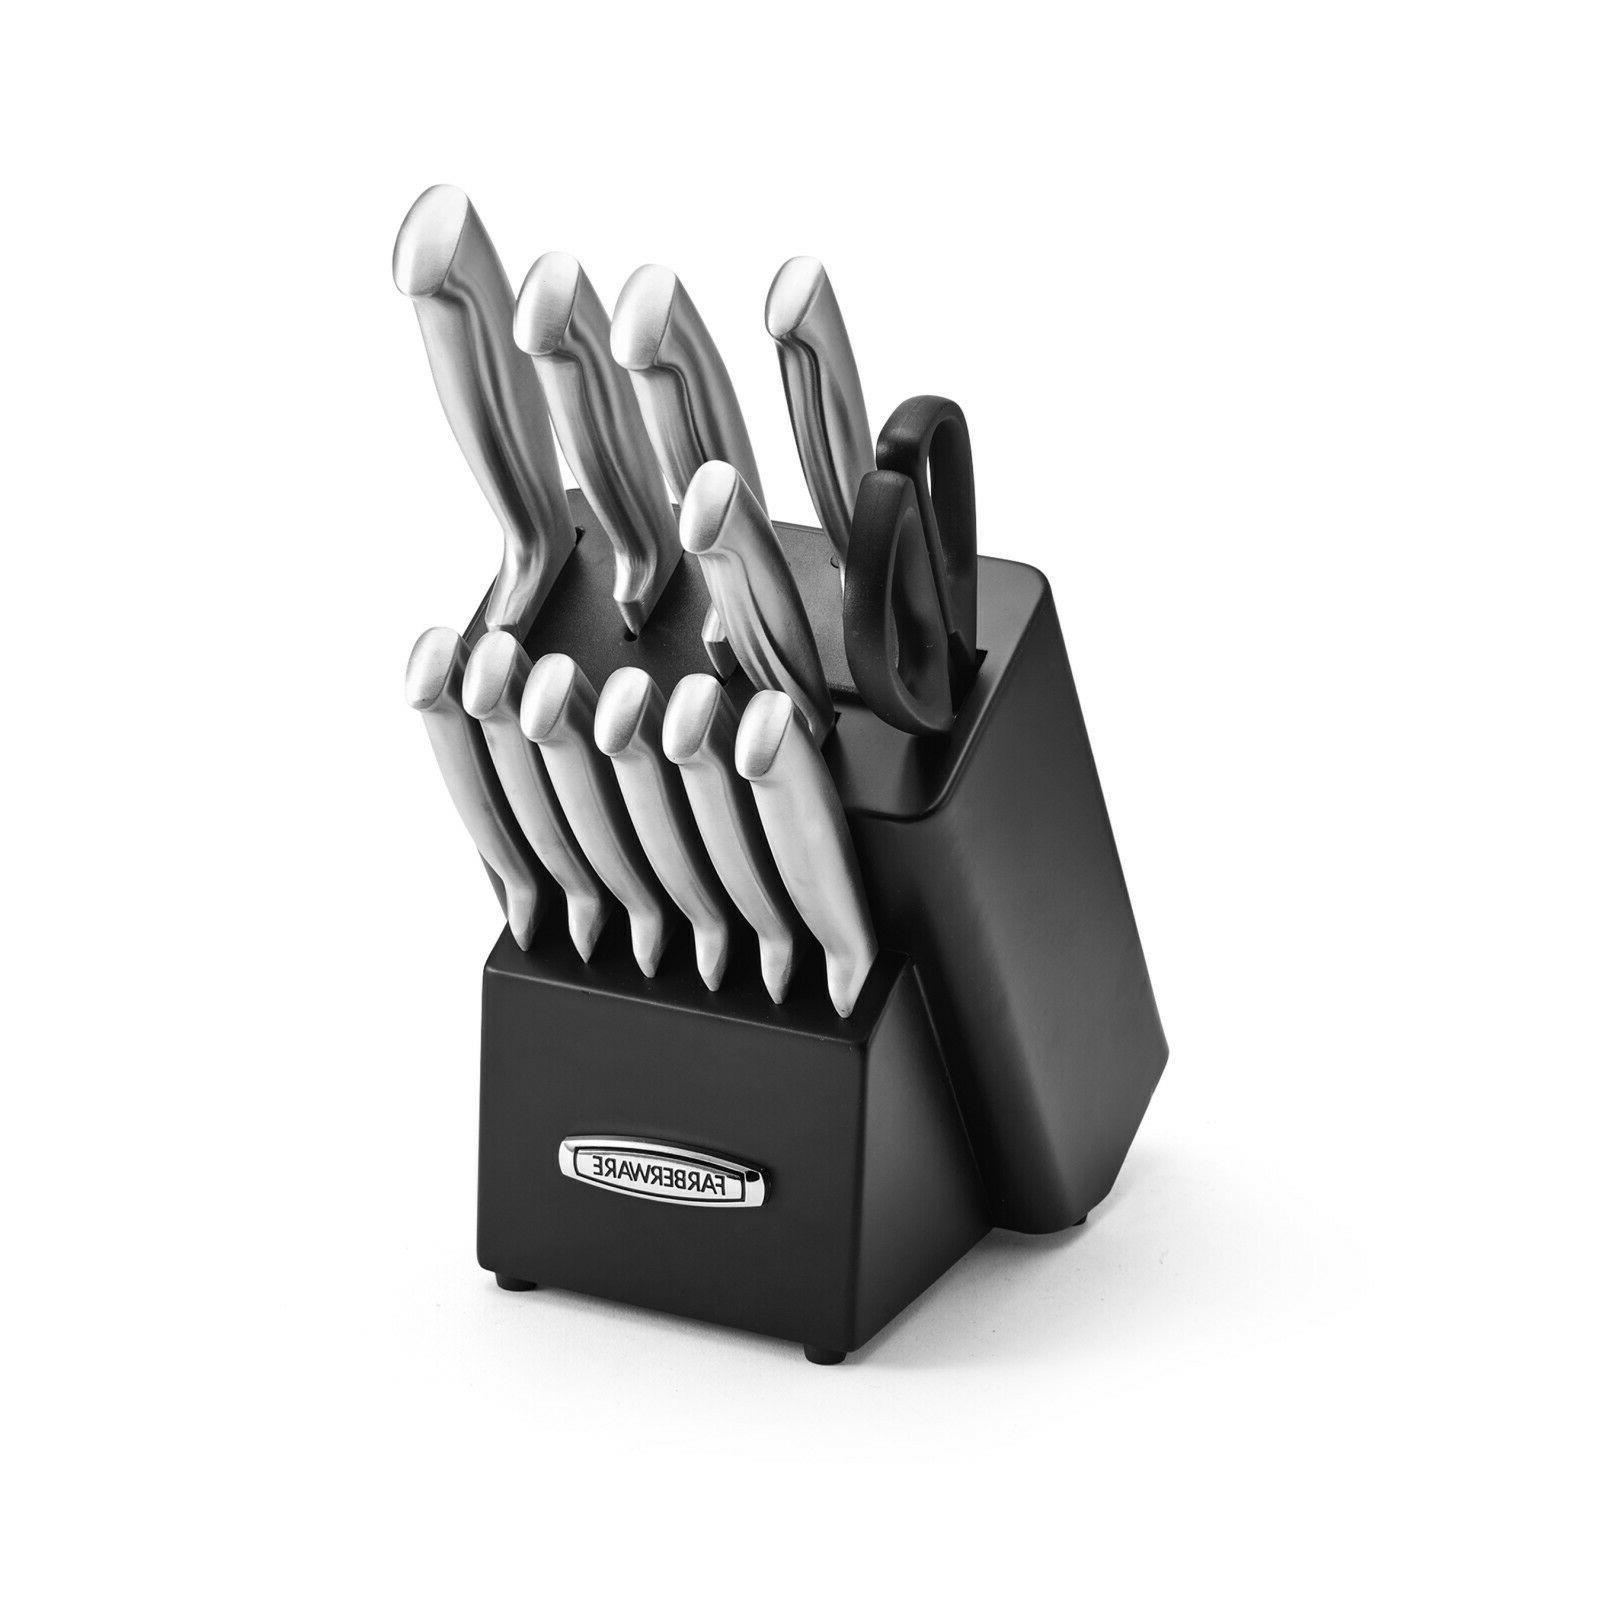 Self Sharpening Knife Set Commercial Kitchen Knives Stainles